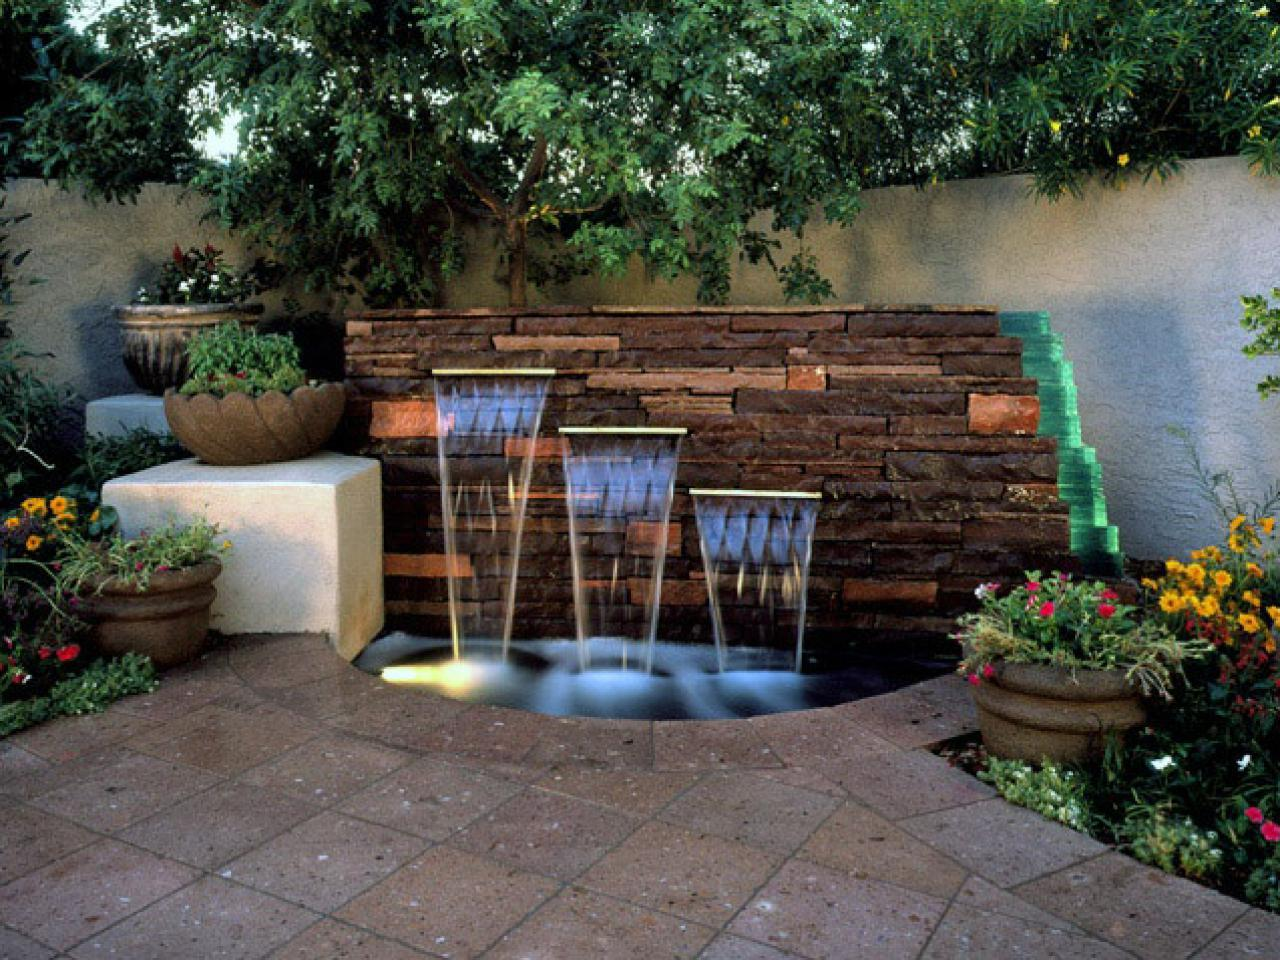 53 Inspirasi Desain Air Mancur Cantik Di Taman Rumahku Unik